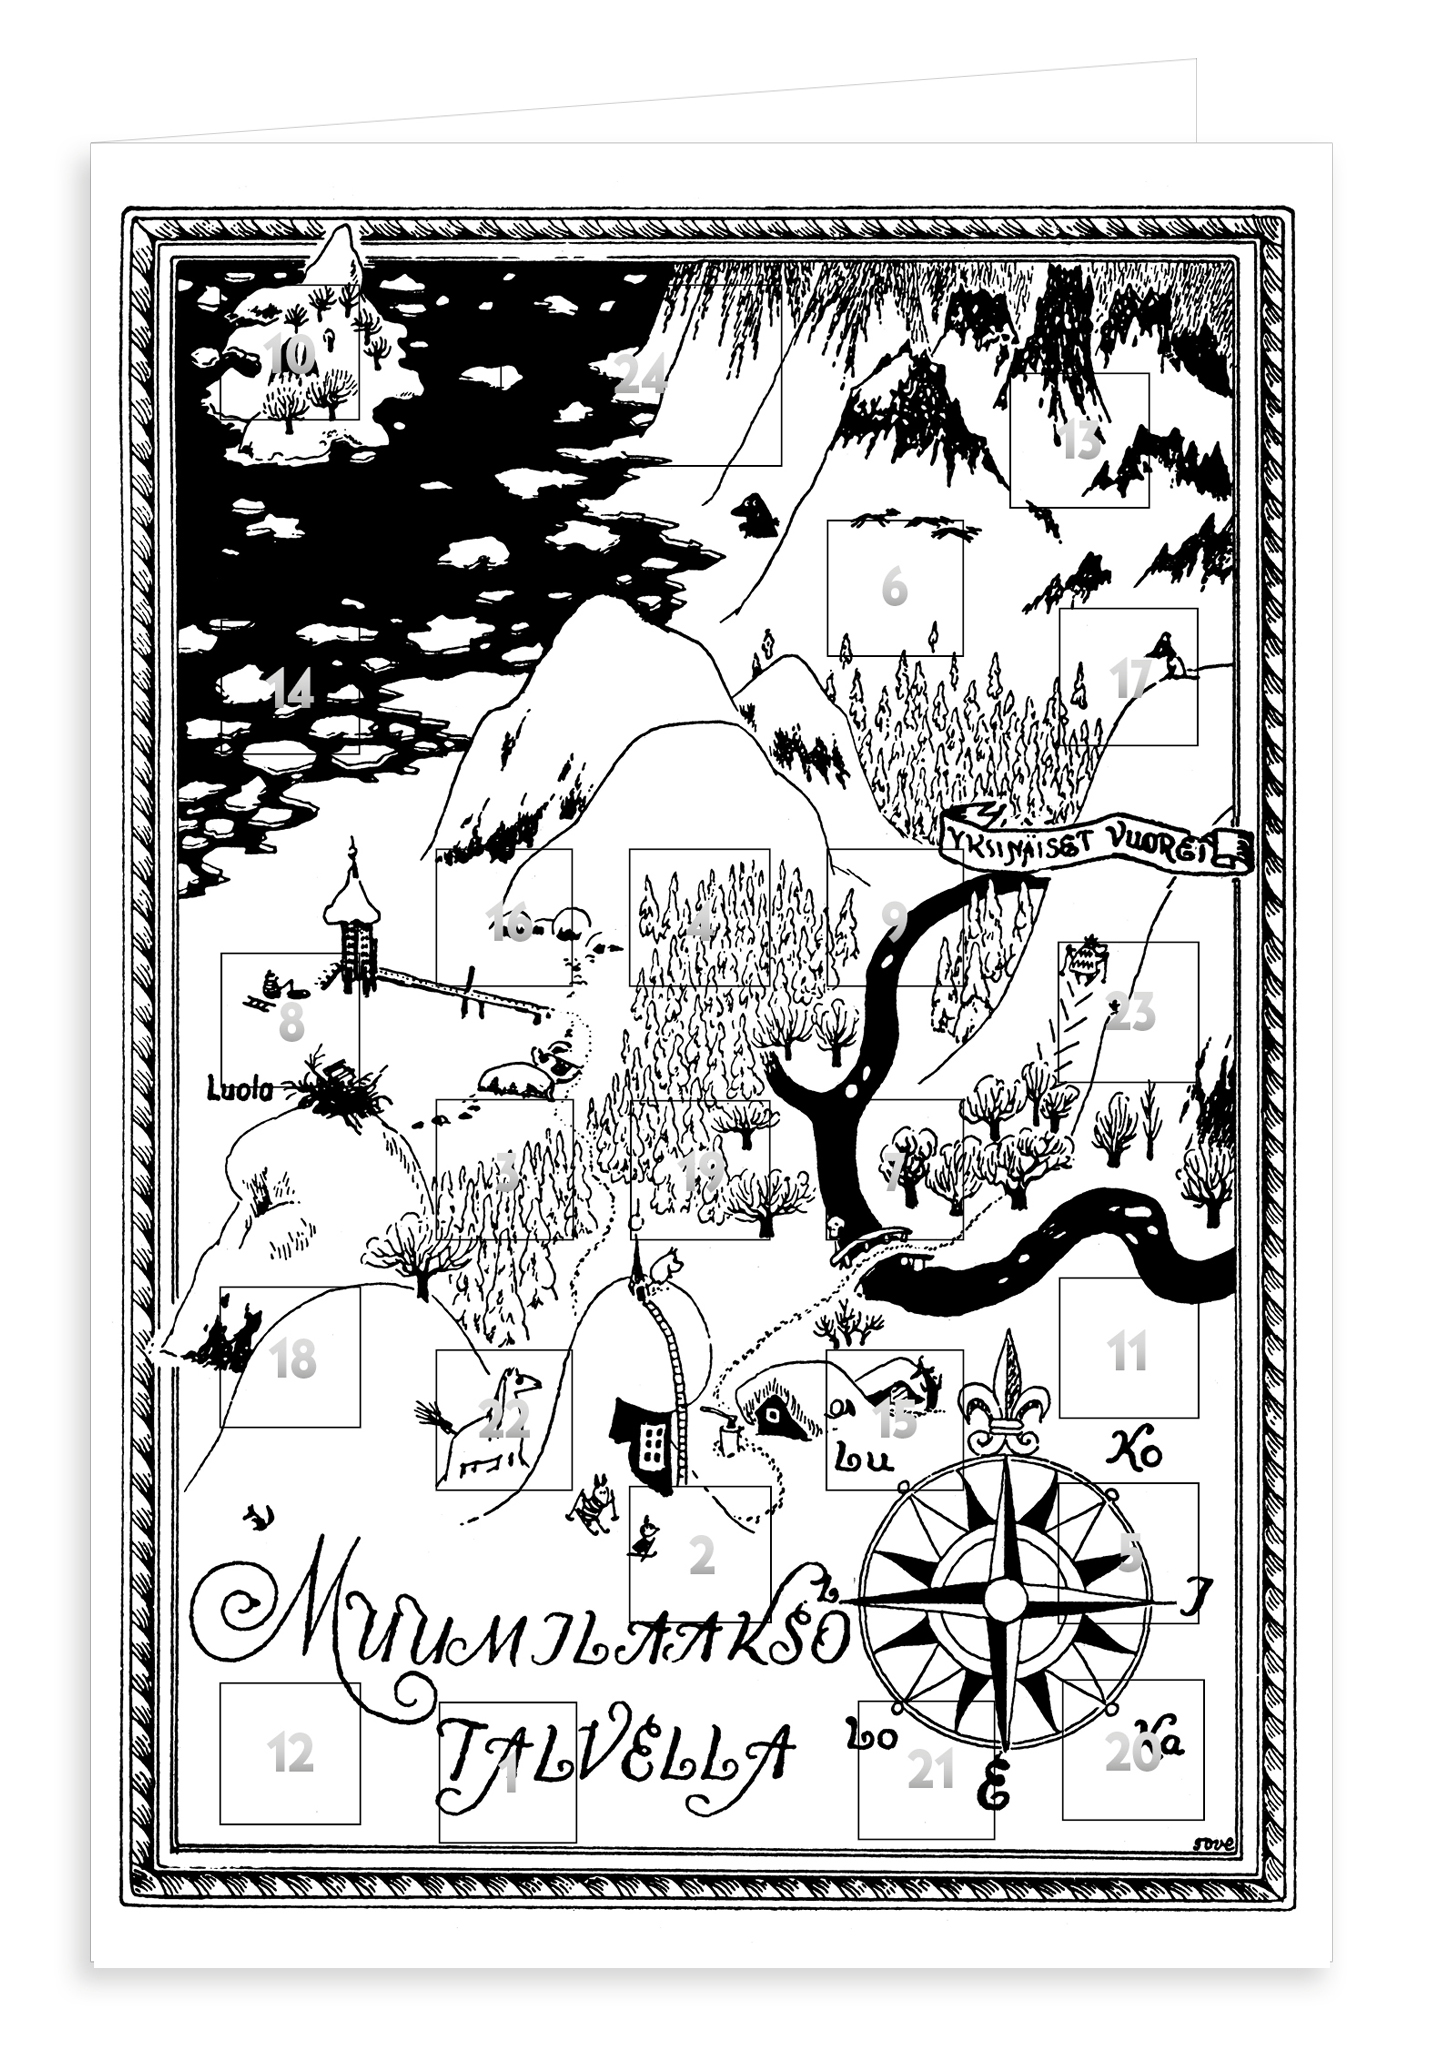 Putinki Advent Calendar Muumilaakso talvella